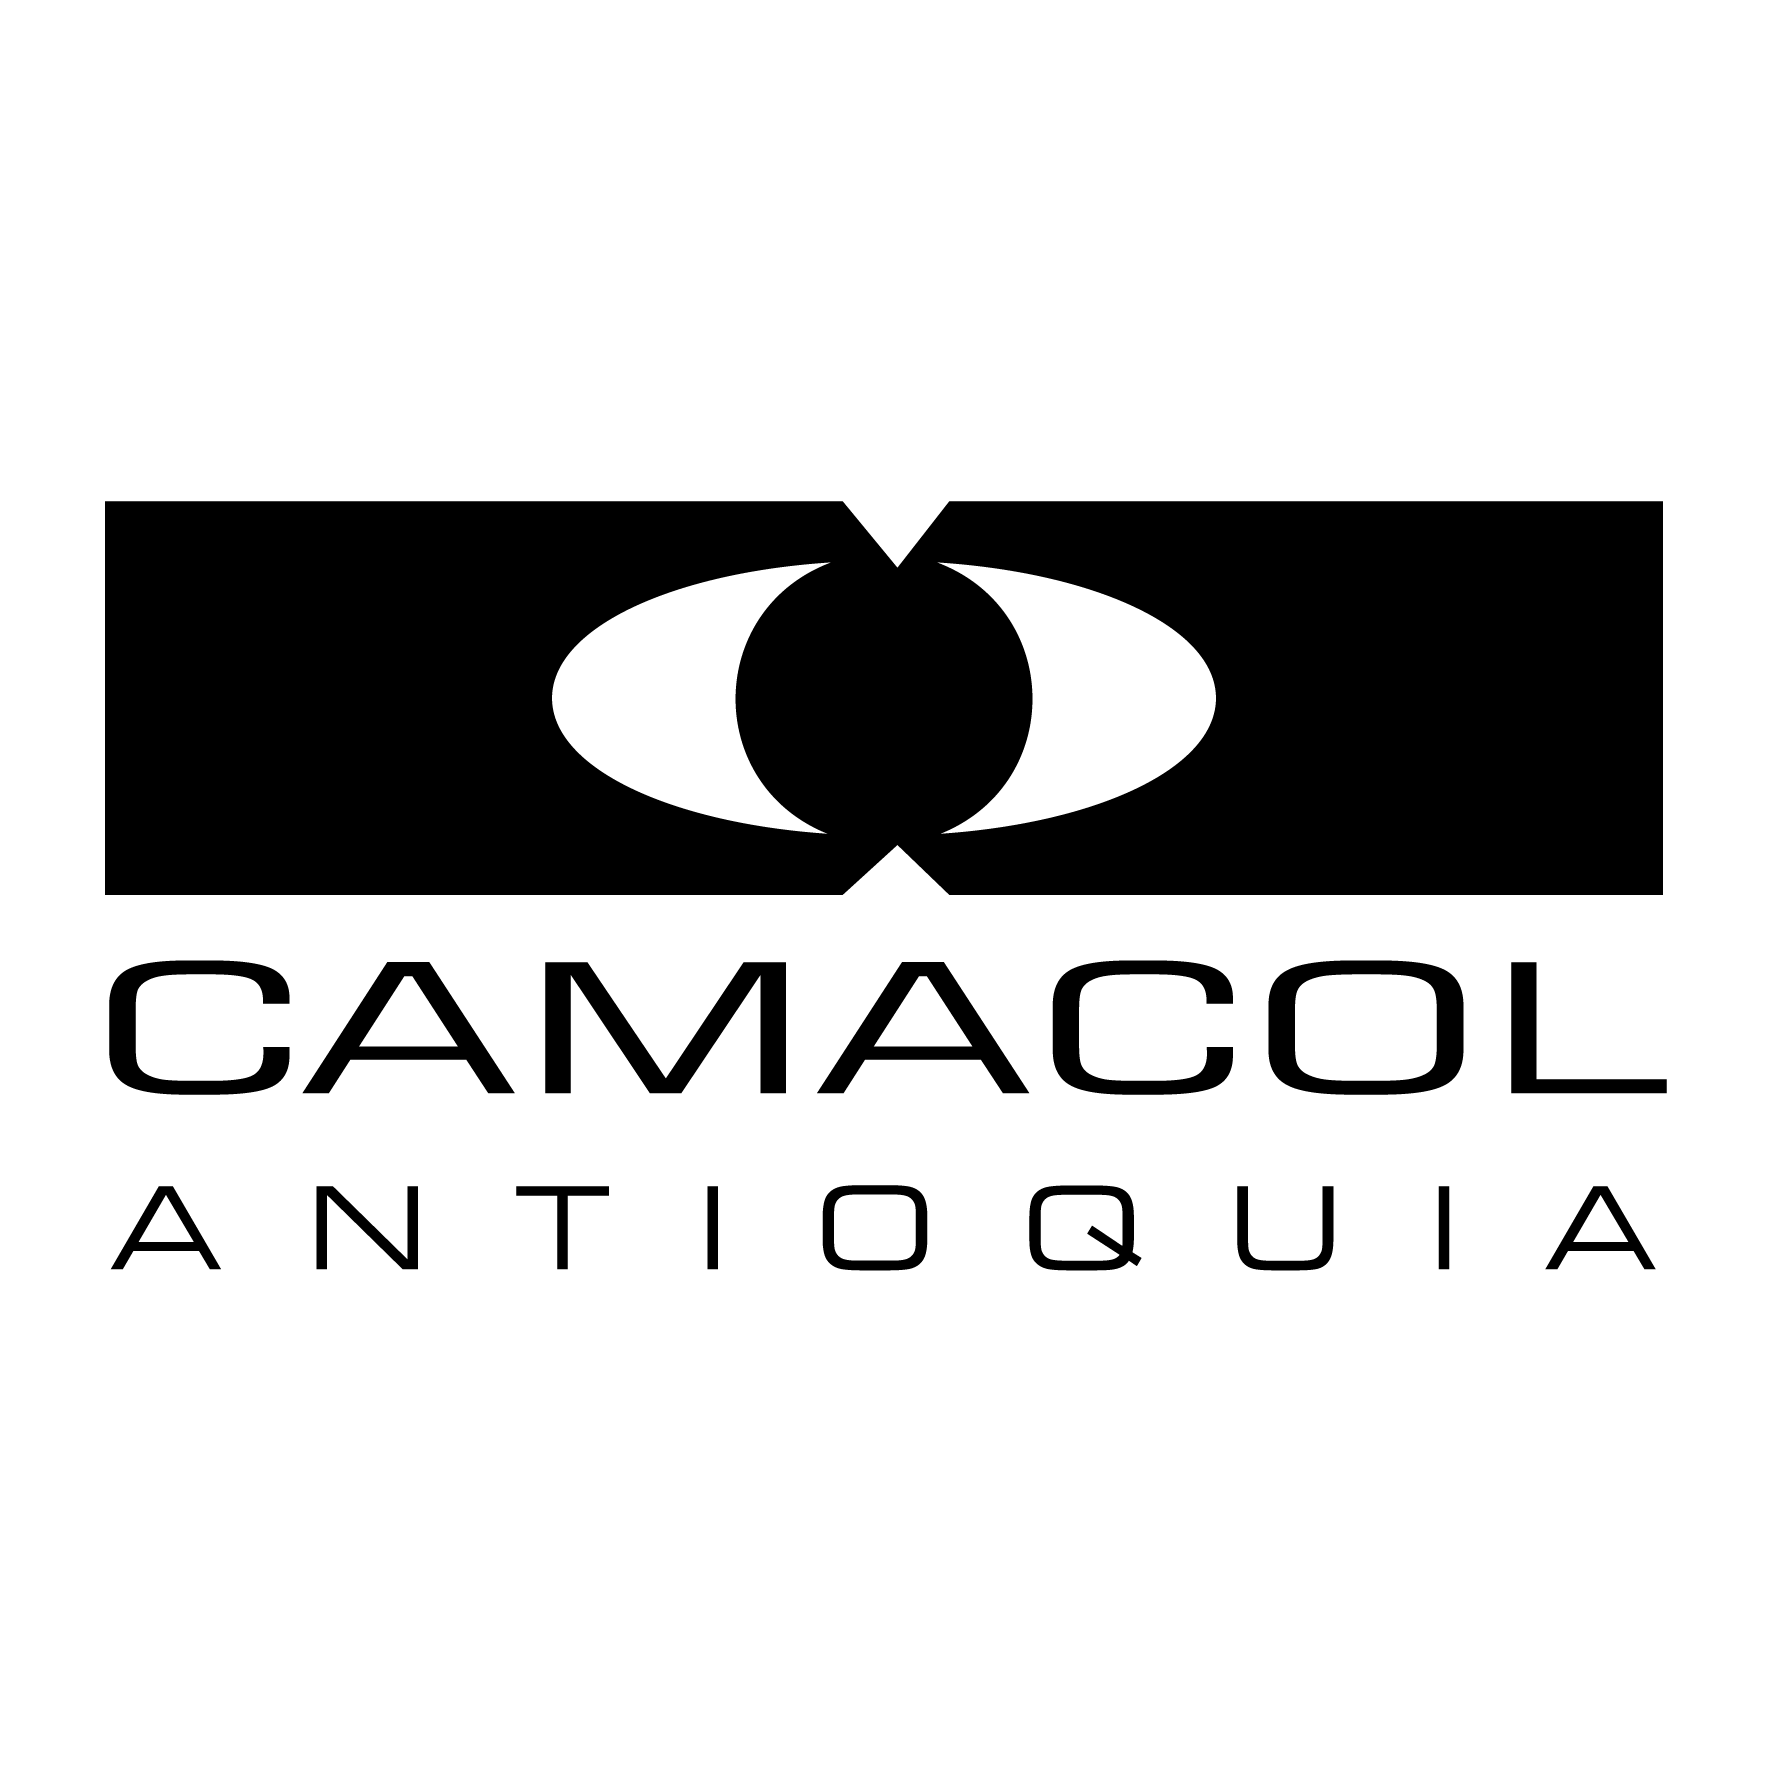 Logonegro0115586241951558624195